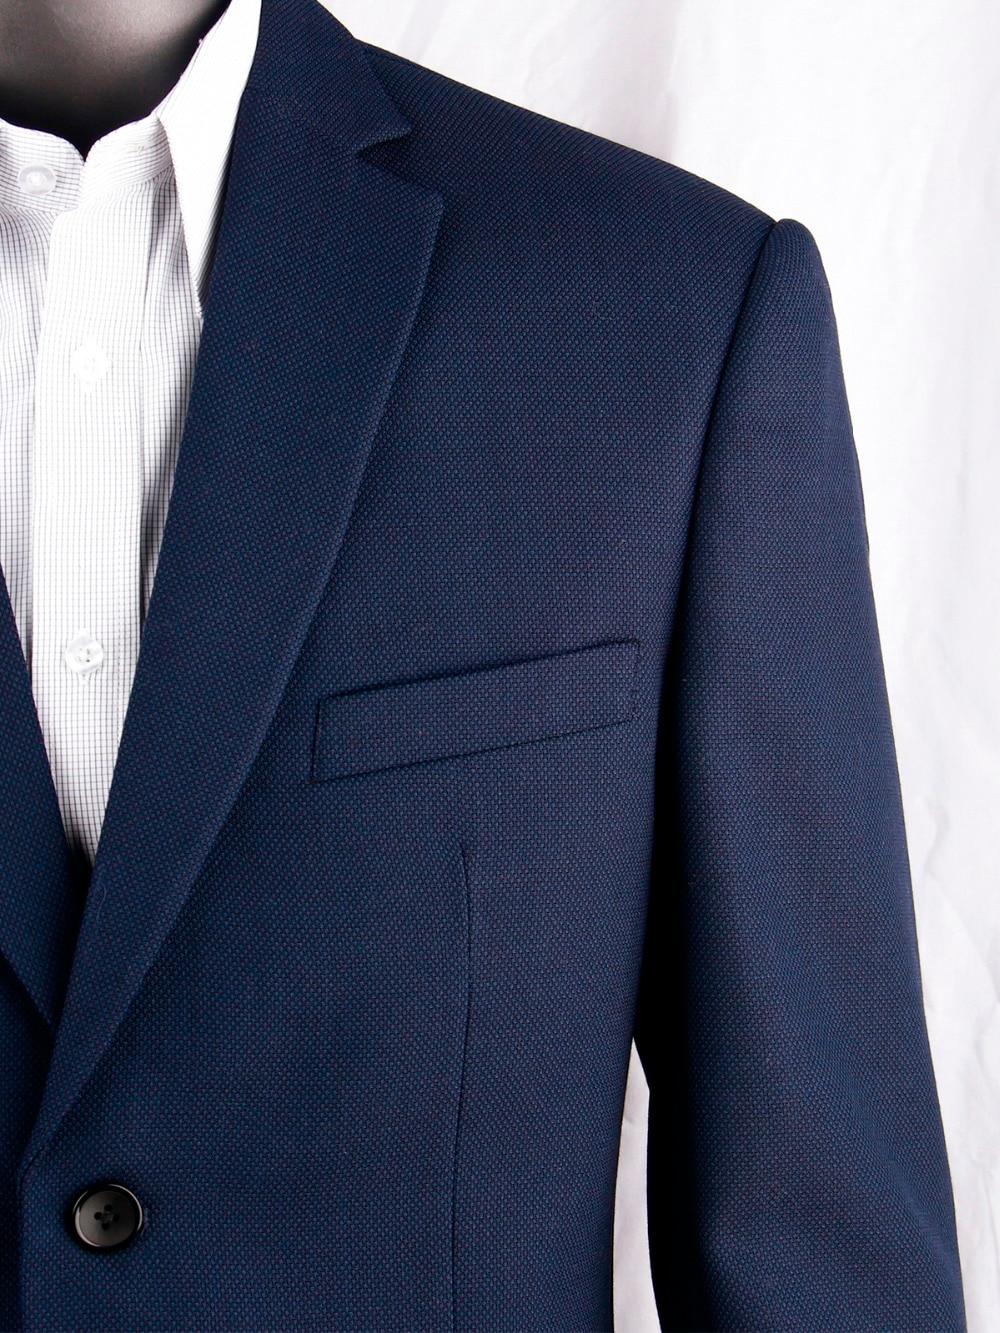 Navy Blue Nailhead Business Men Suits Custom Made Slim Fit Wool Blend Bird-eye Wedding Suits For Men, Tailor Made Groom Suit